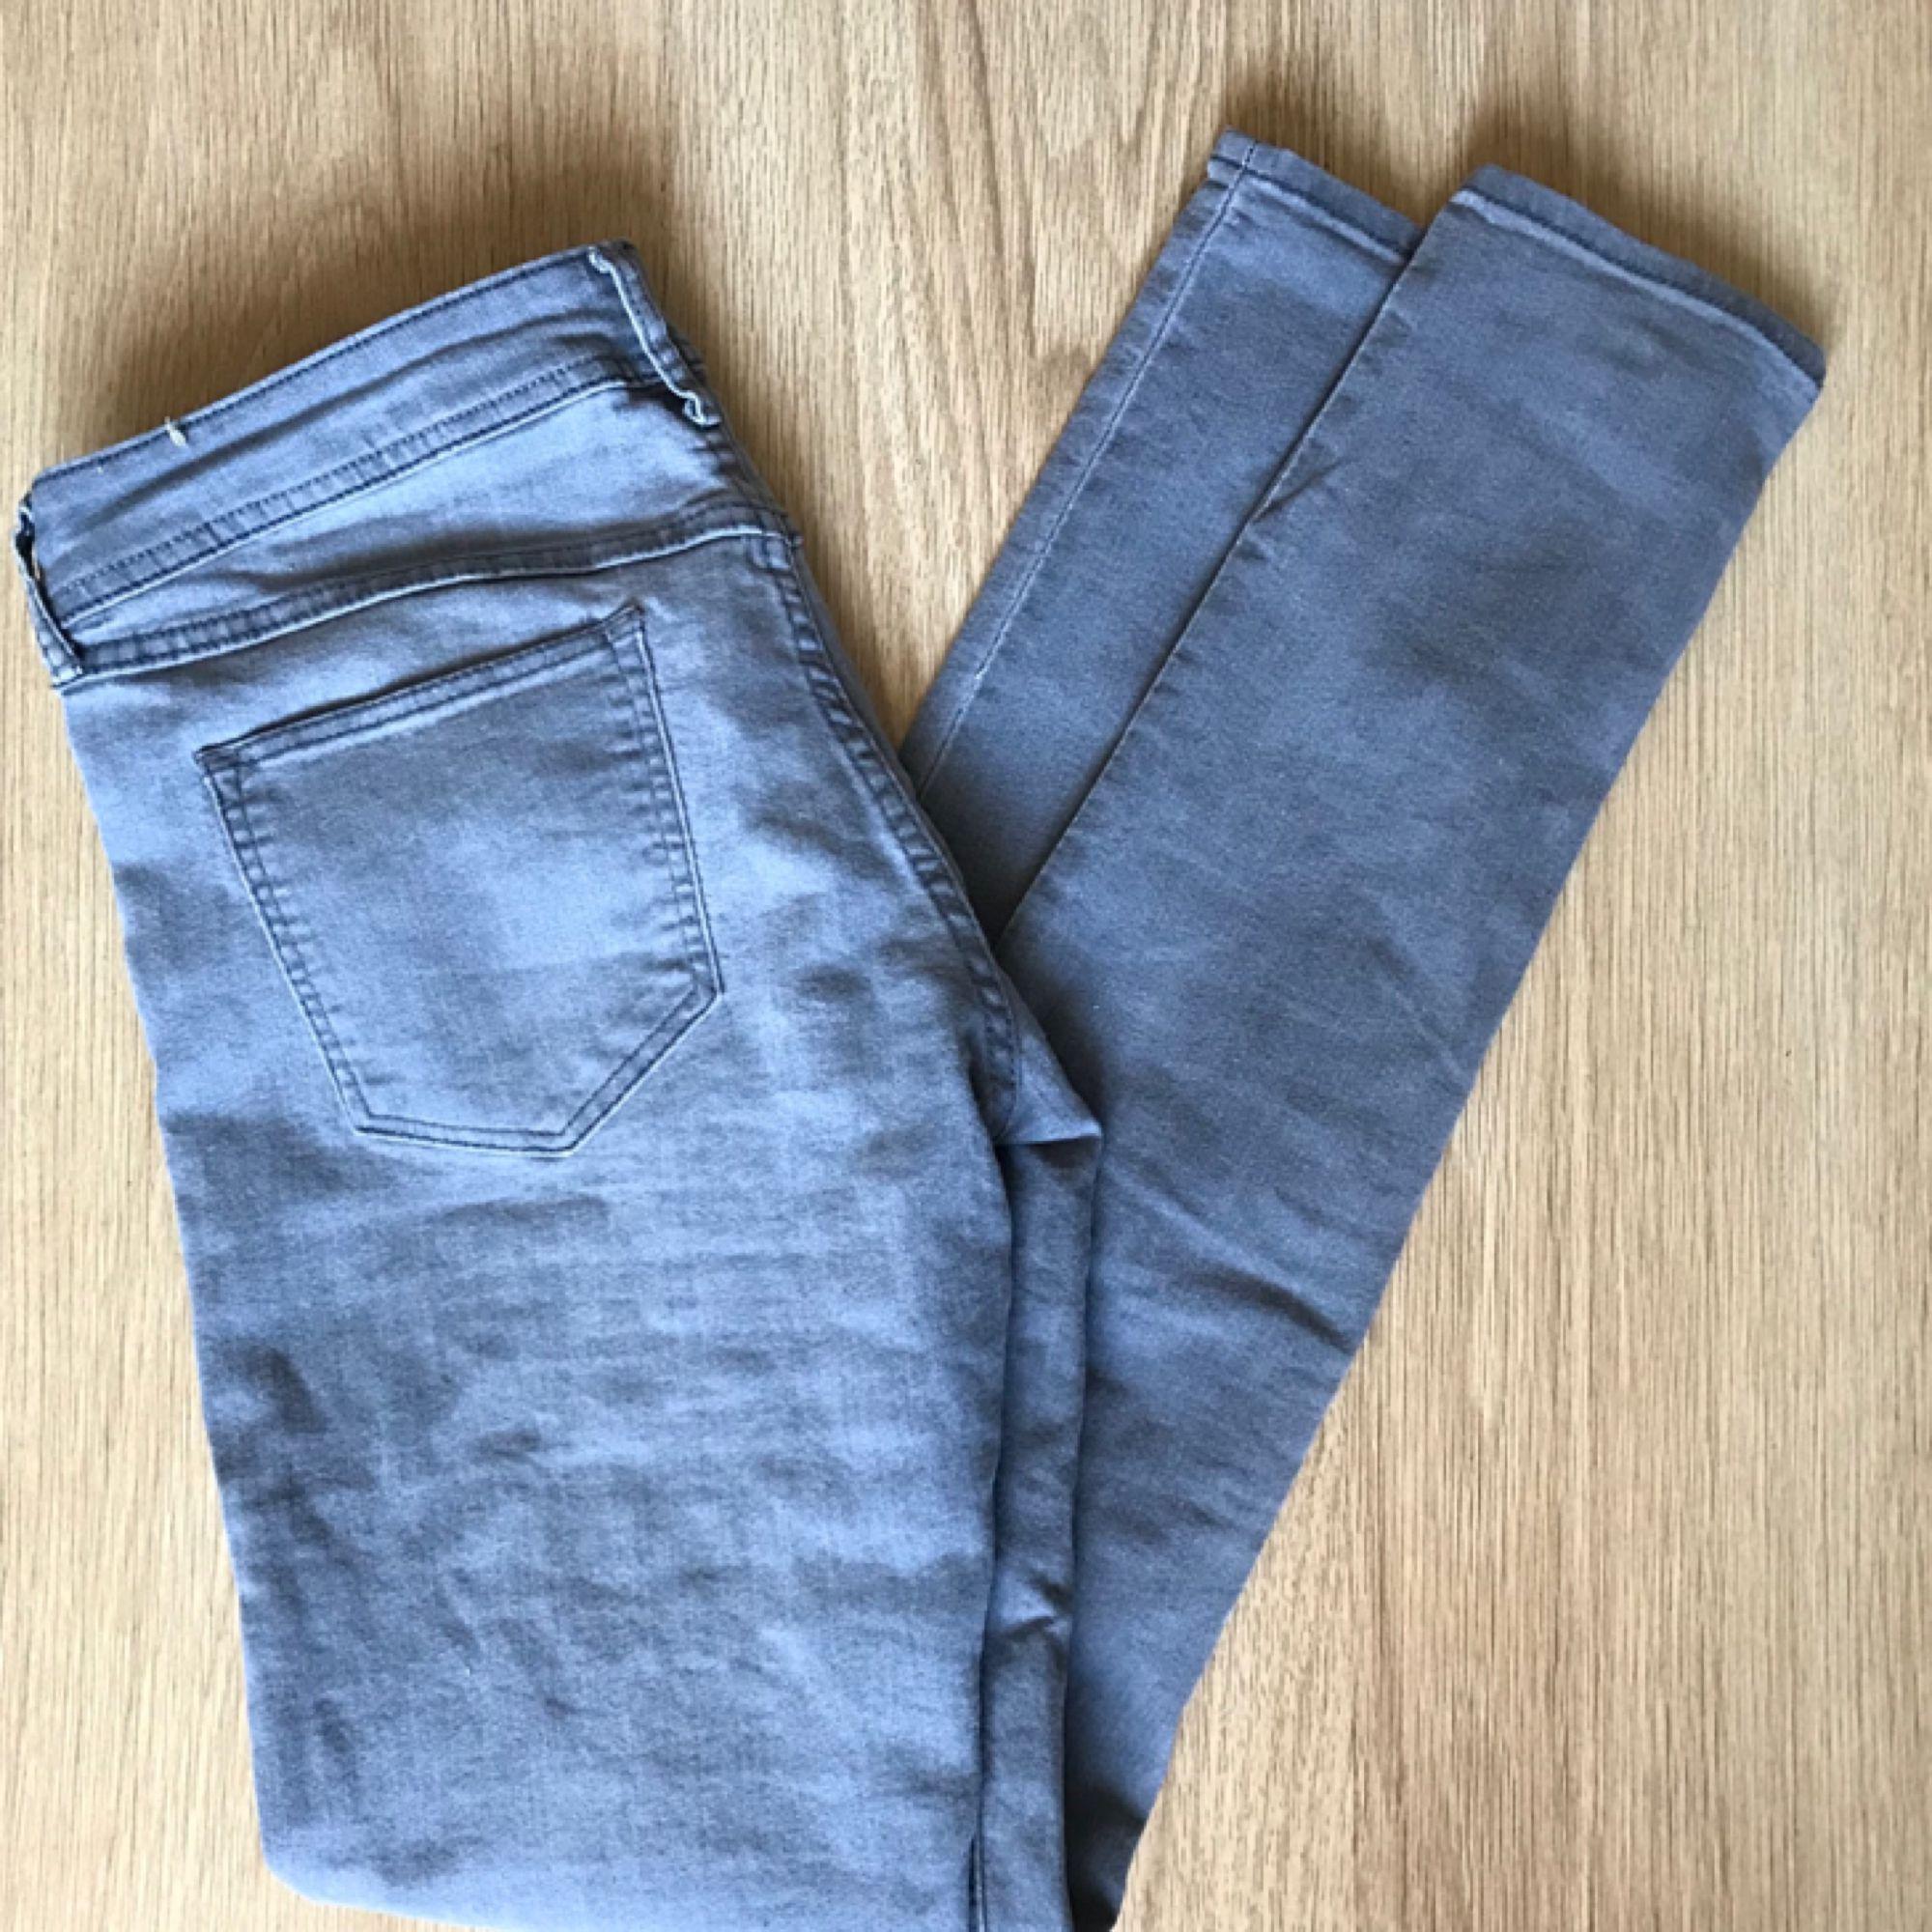 Gråa låg-midjade jeans. Köparen - H M Jeans   Byxor - Second Hand 98646e9cdc180